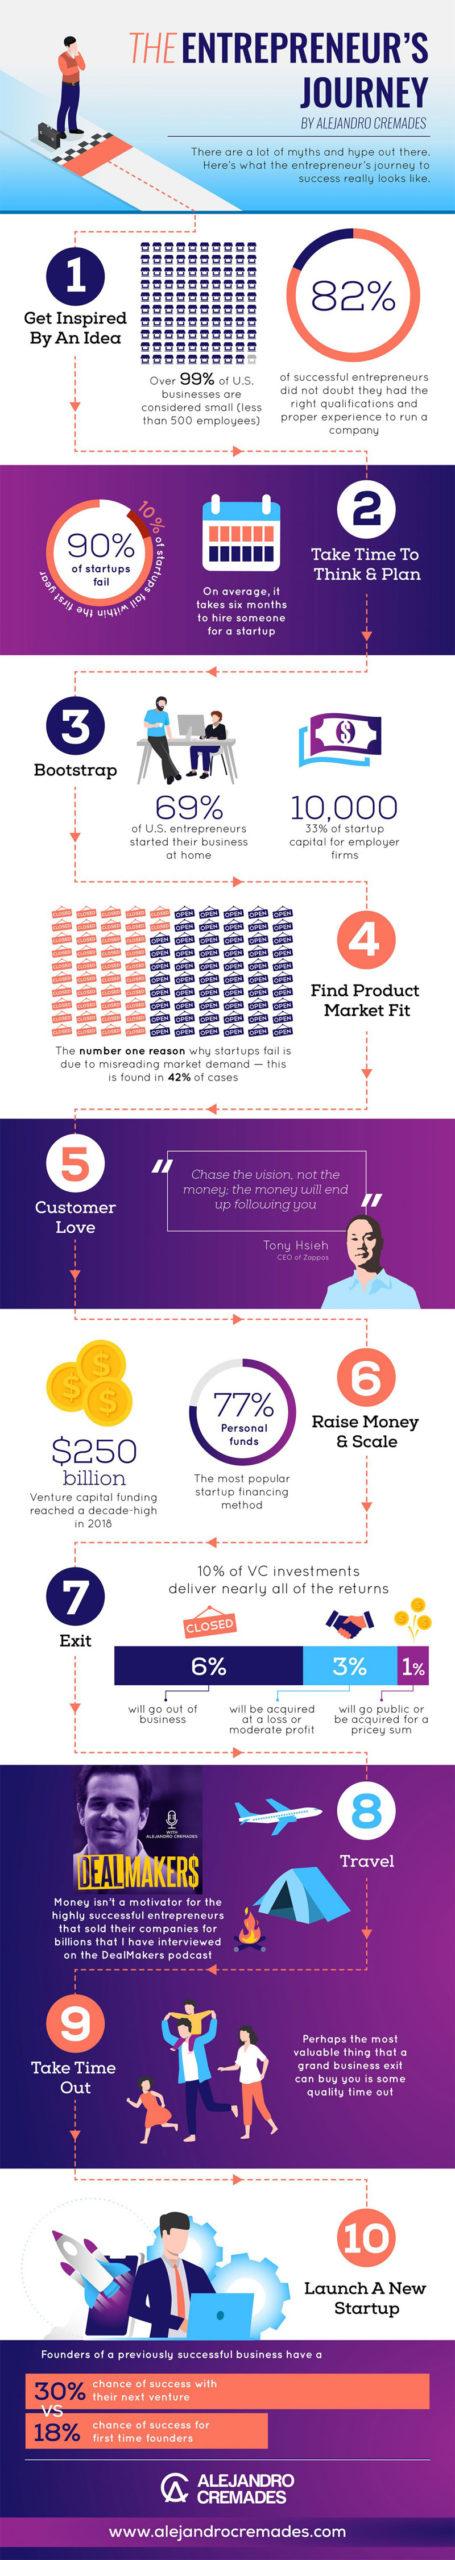 infographic the entrepreneurs journey